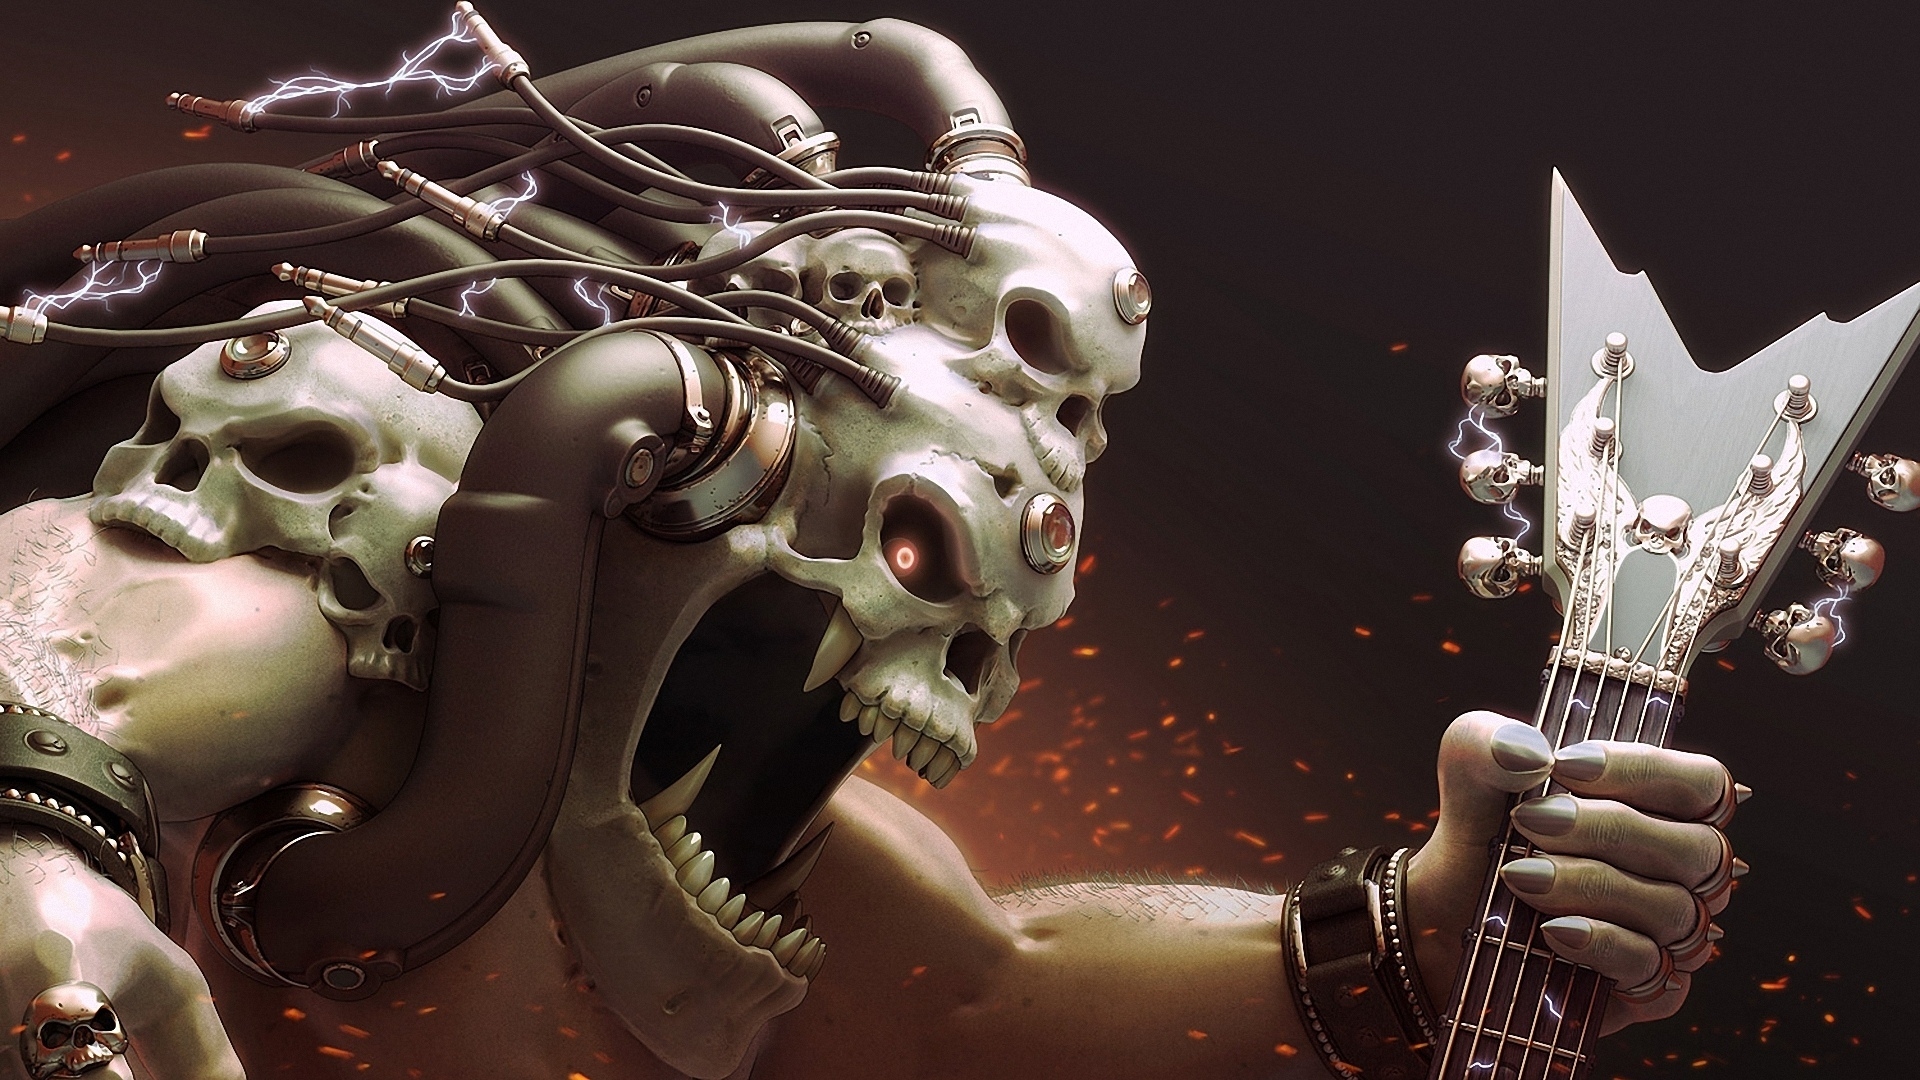 electricity monster music heavy metal skulls wallpaper background 1920x1080